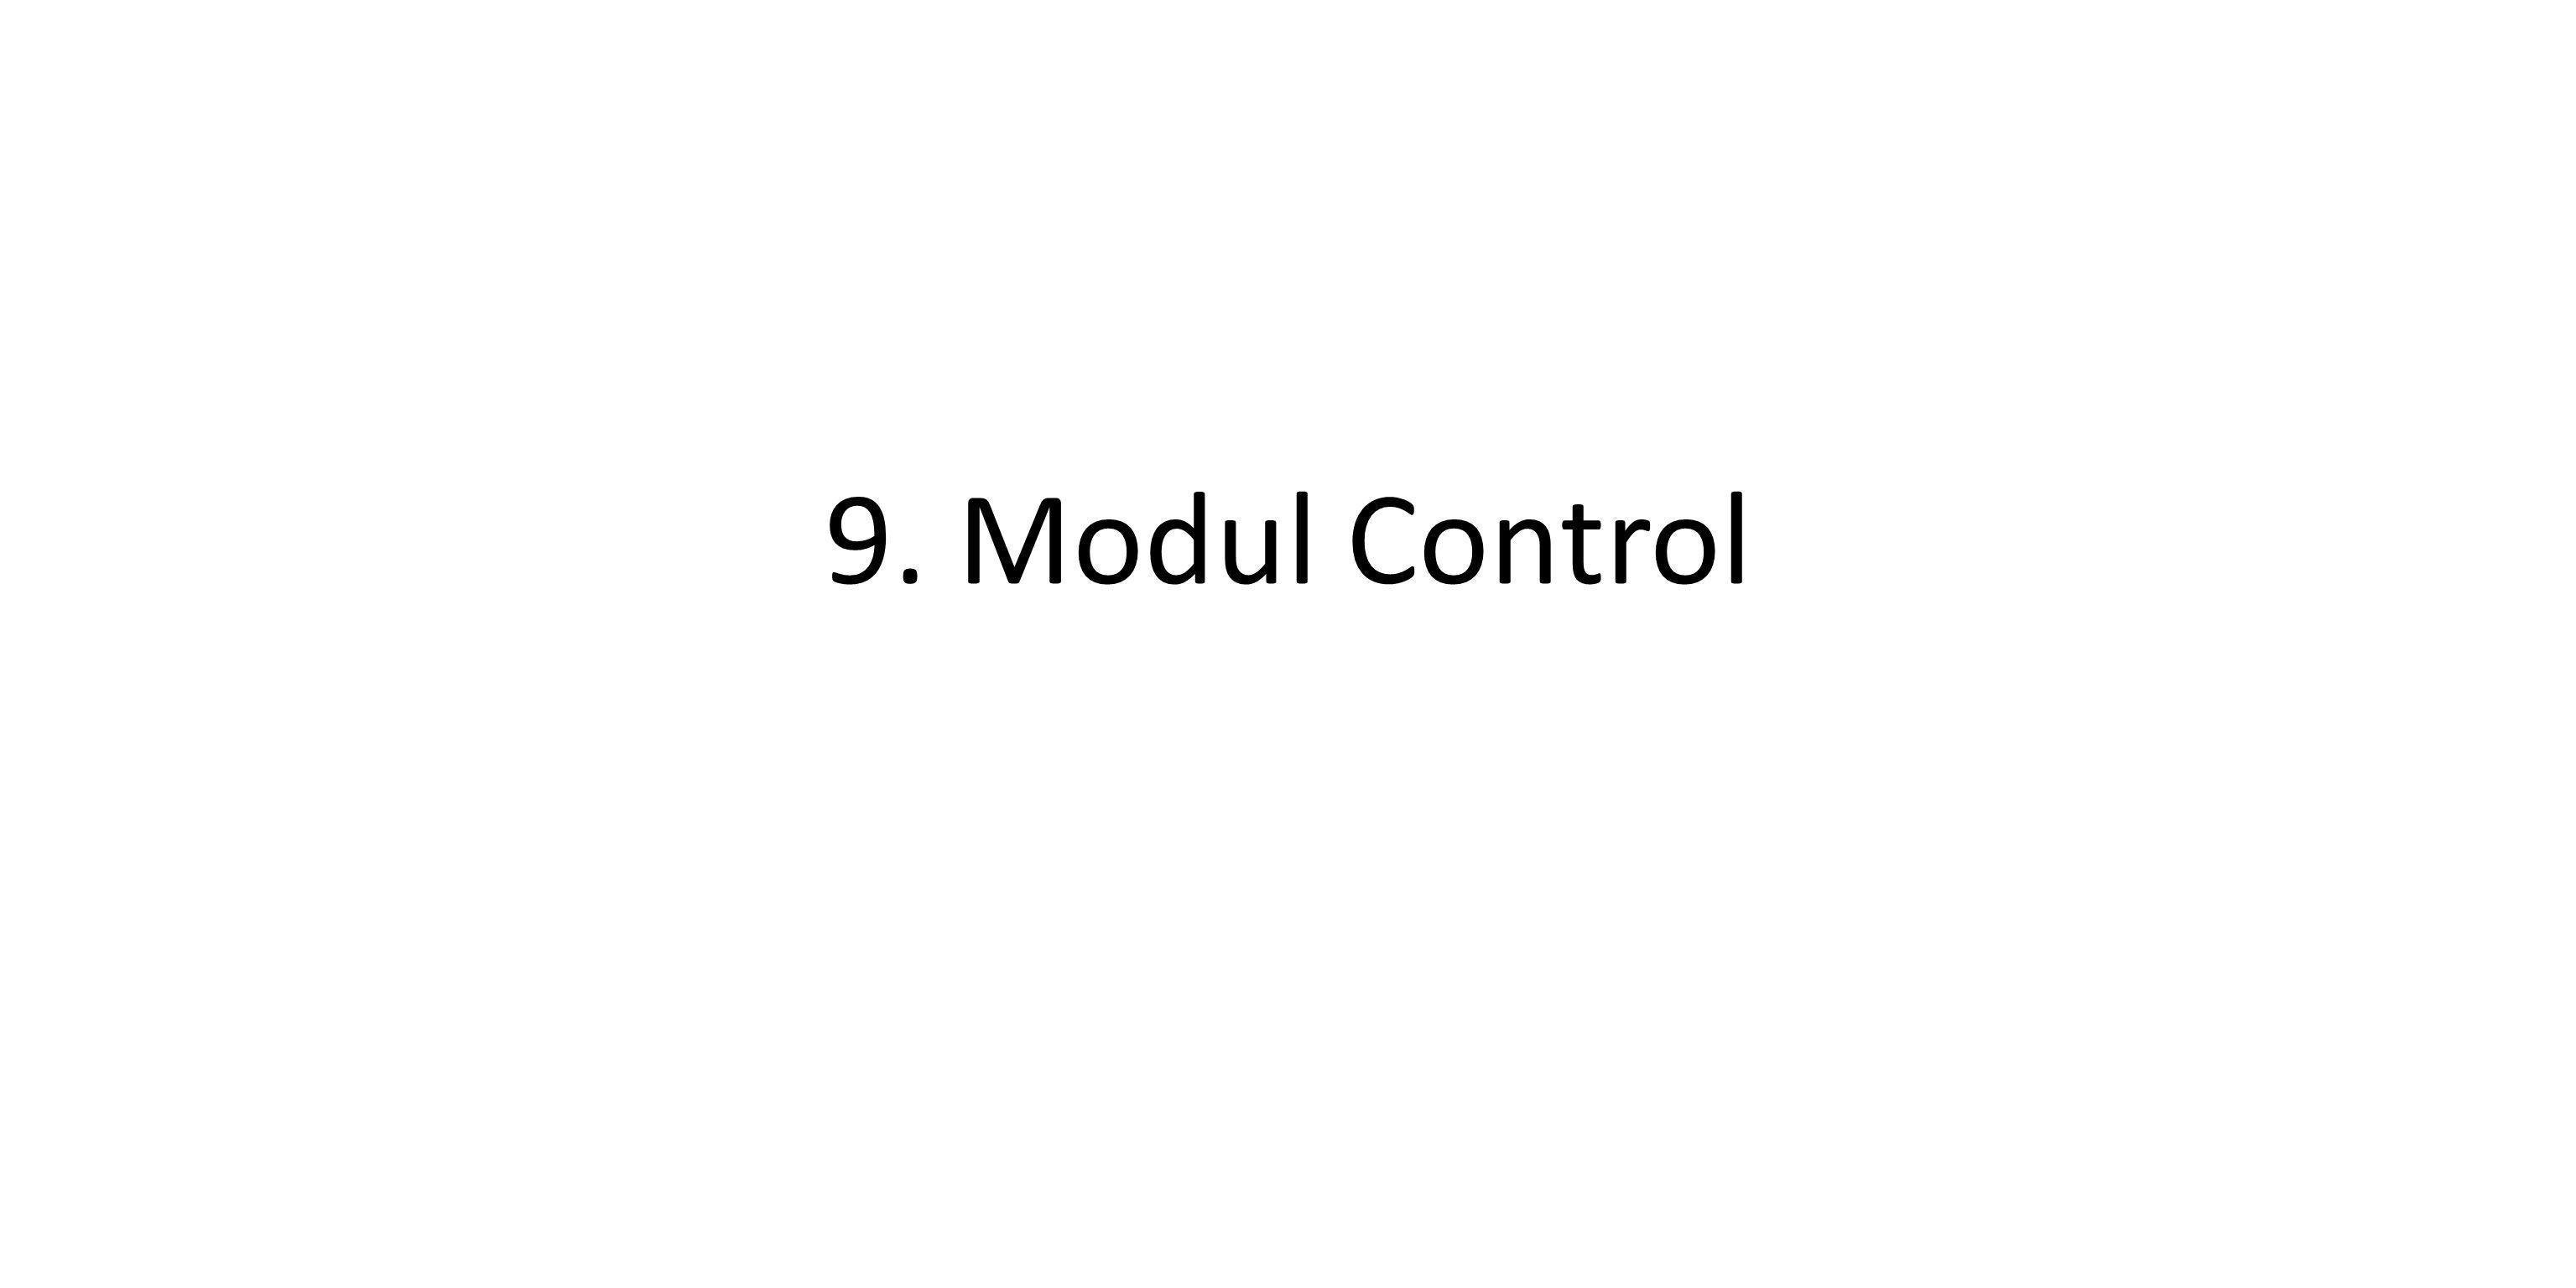 Pengenalan Control Perintah yang ada di blok control menjelaskan tentang cara mengatur pergerakkan di dalam objek untuk mengulangi perintah gerakan secara terus – menerus dan berhenti dengan kondisi yang diinginkan.